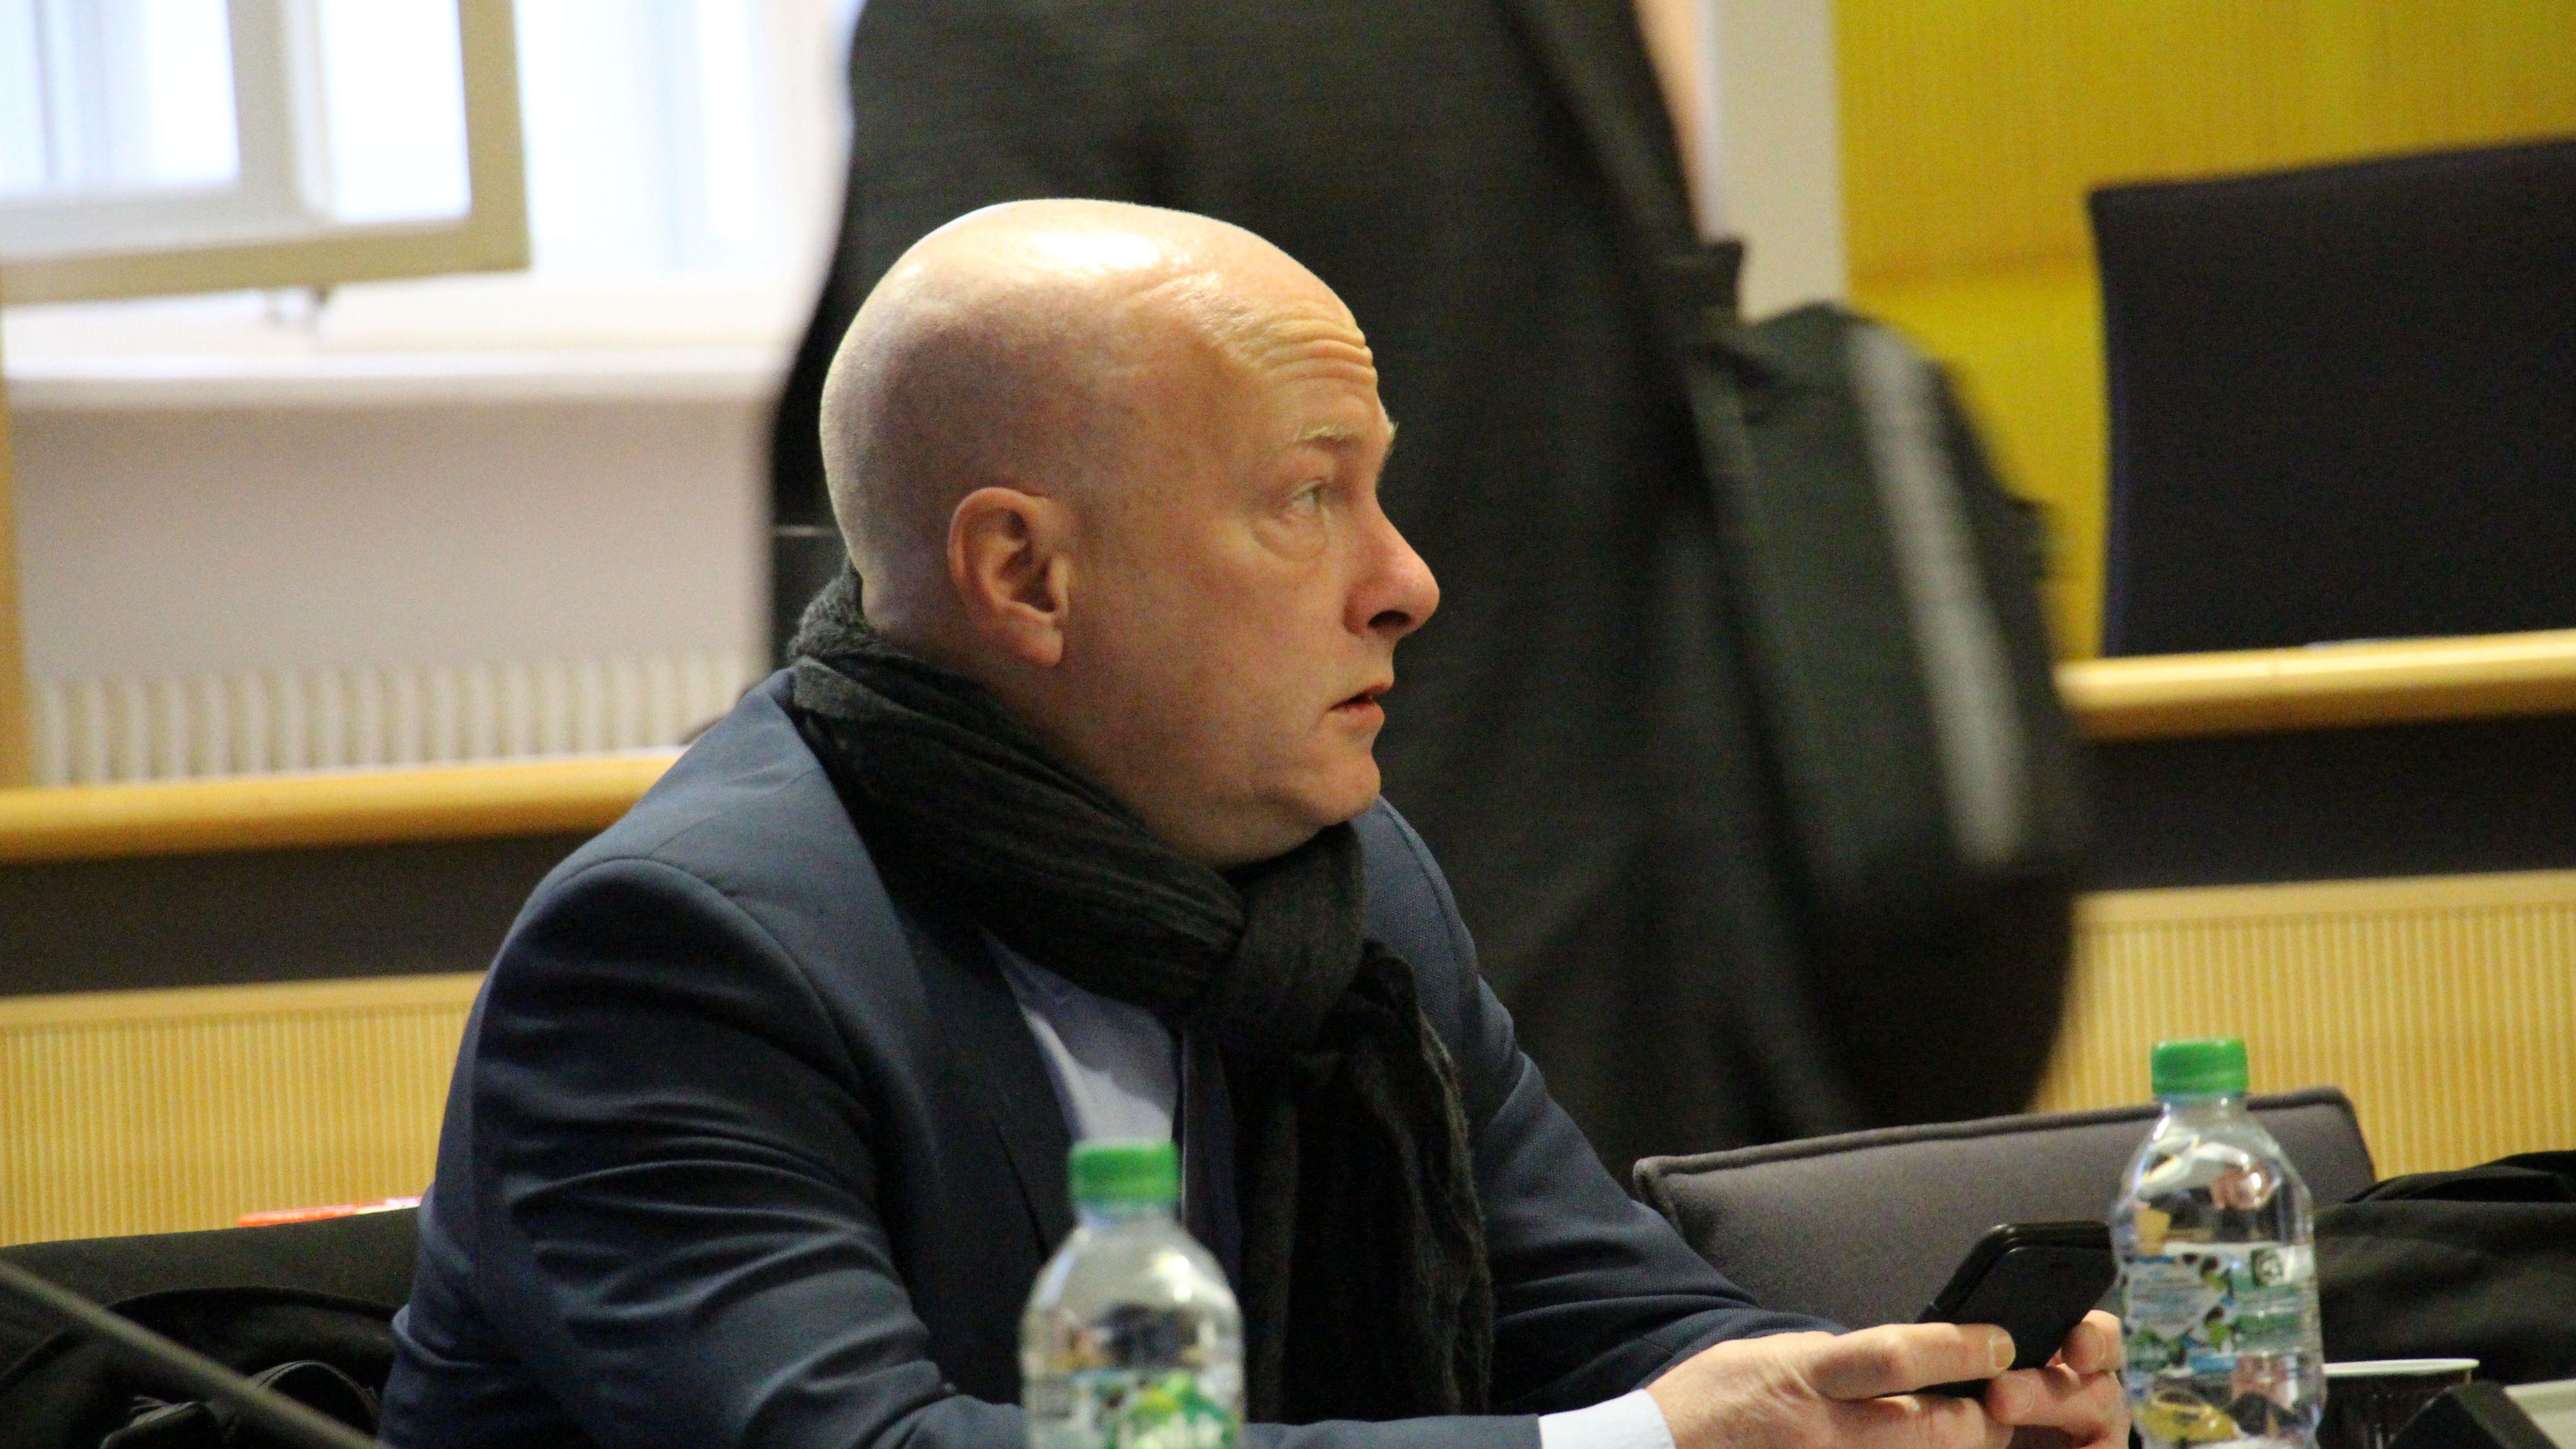 Der ehemalige Regensburger Oberbürgermeister Joachim Wolbergs im Gerichtssaal